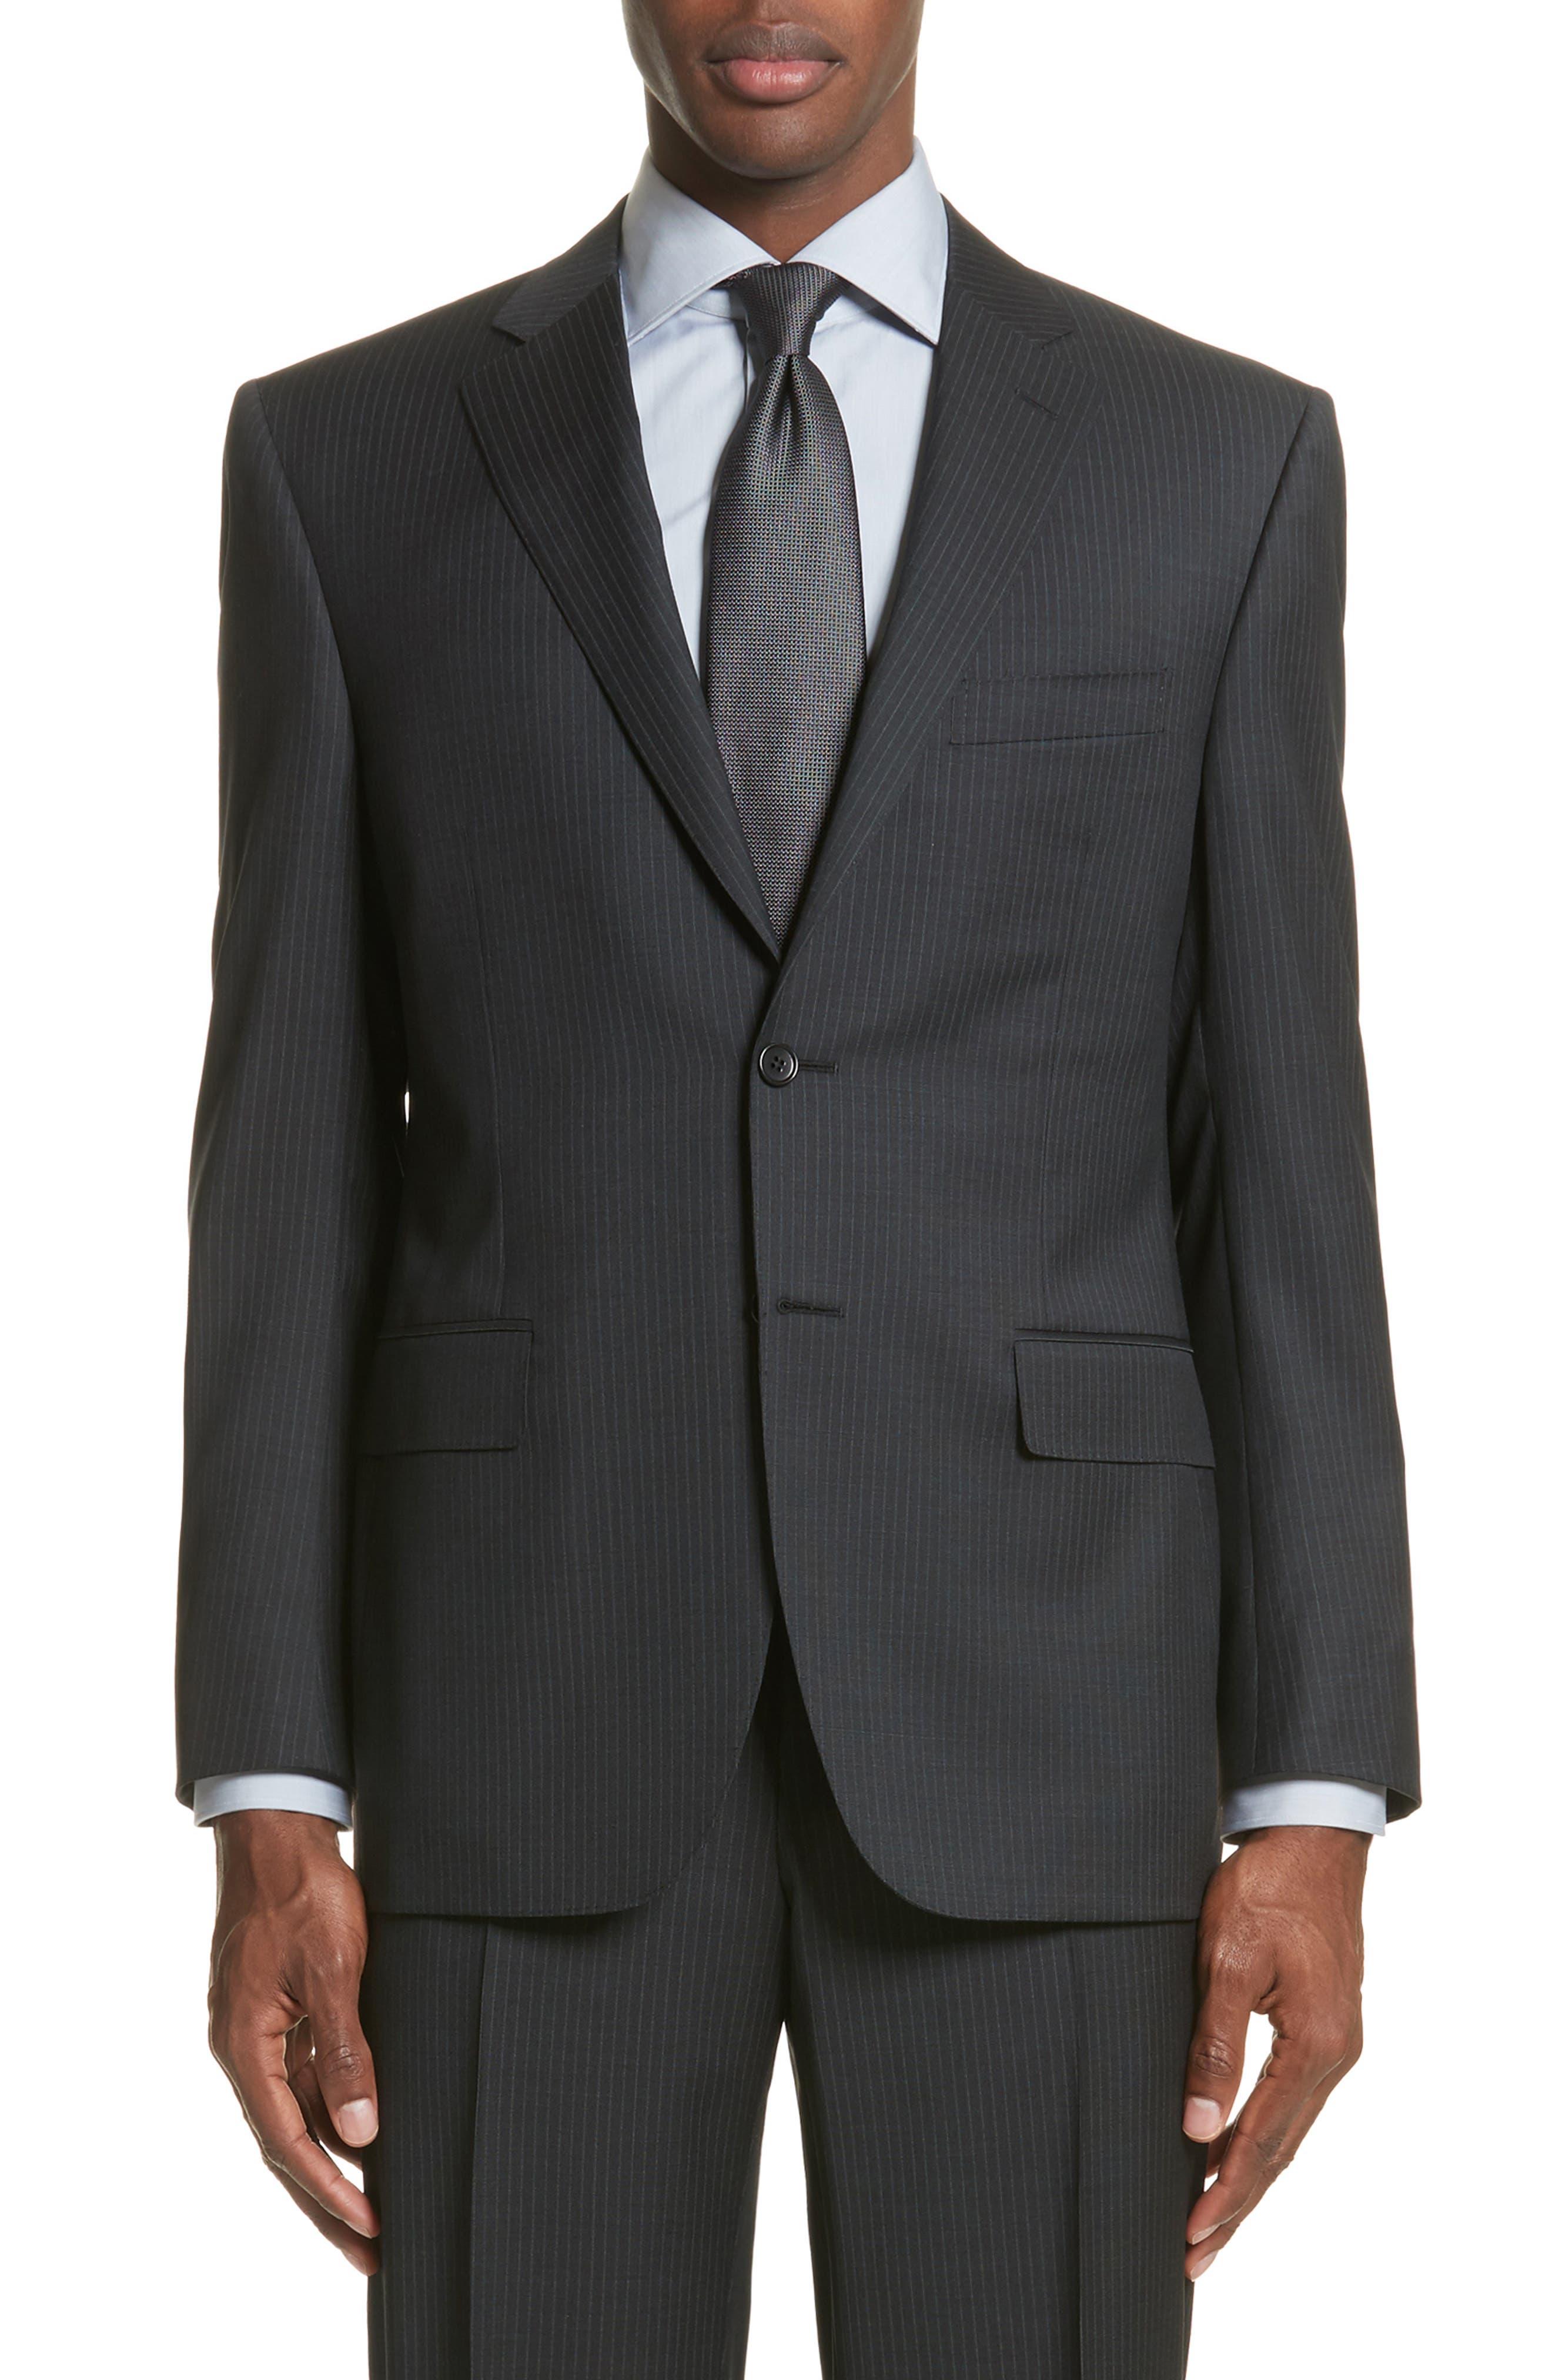 CANALI,                             Classic Fit Stripe Wool Suit,                             Alternate thumbnail 5, color,                             010